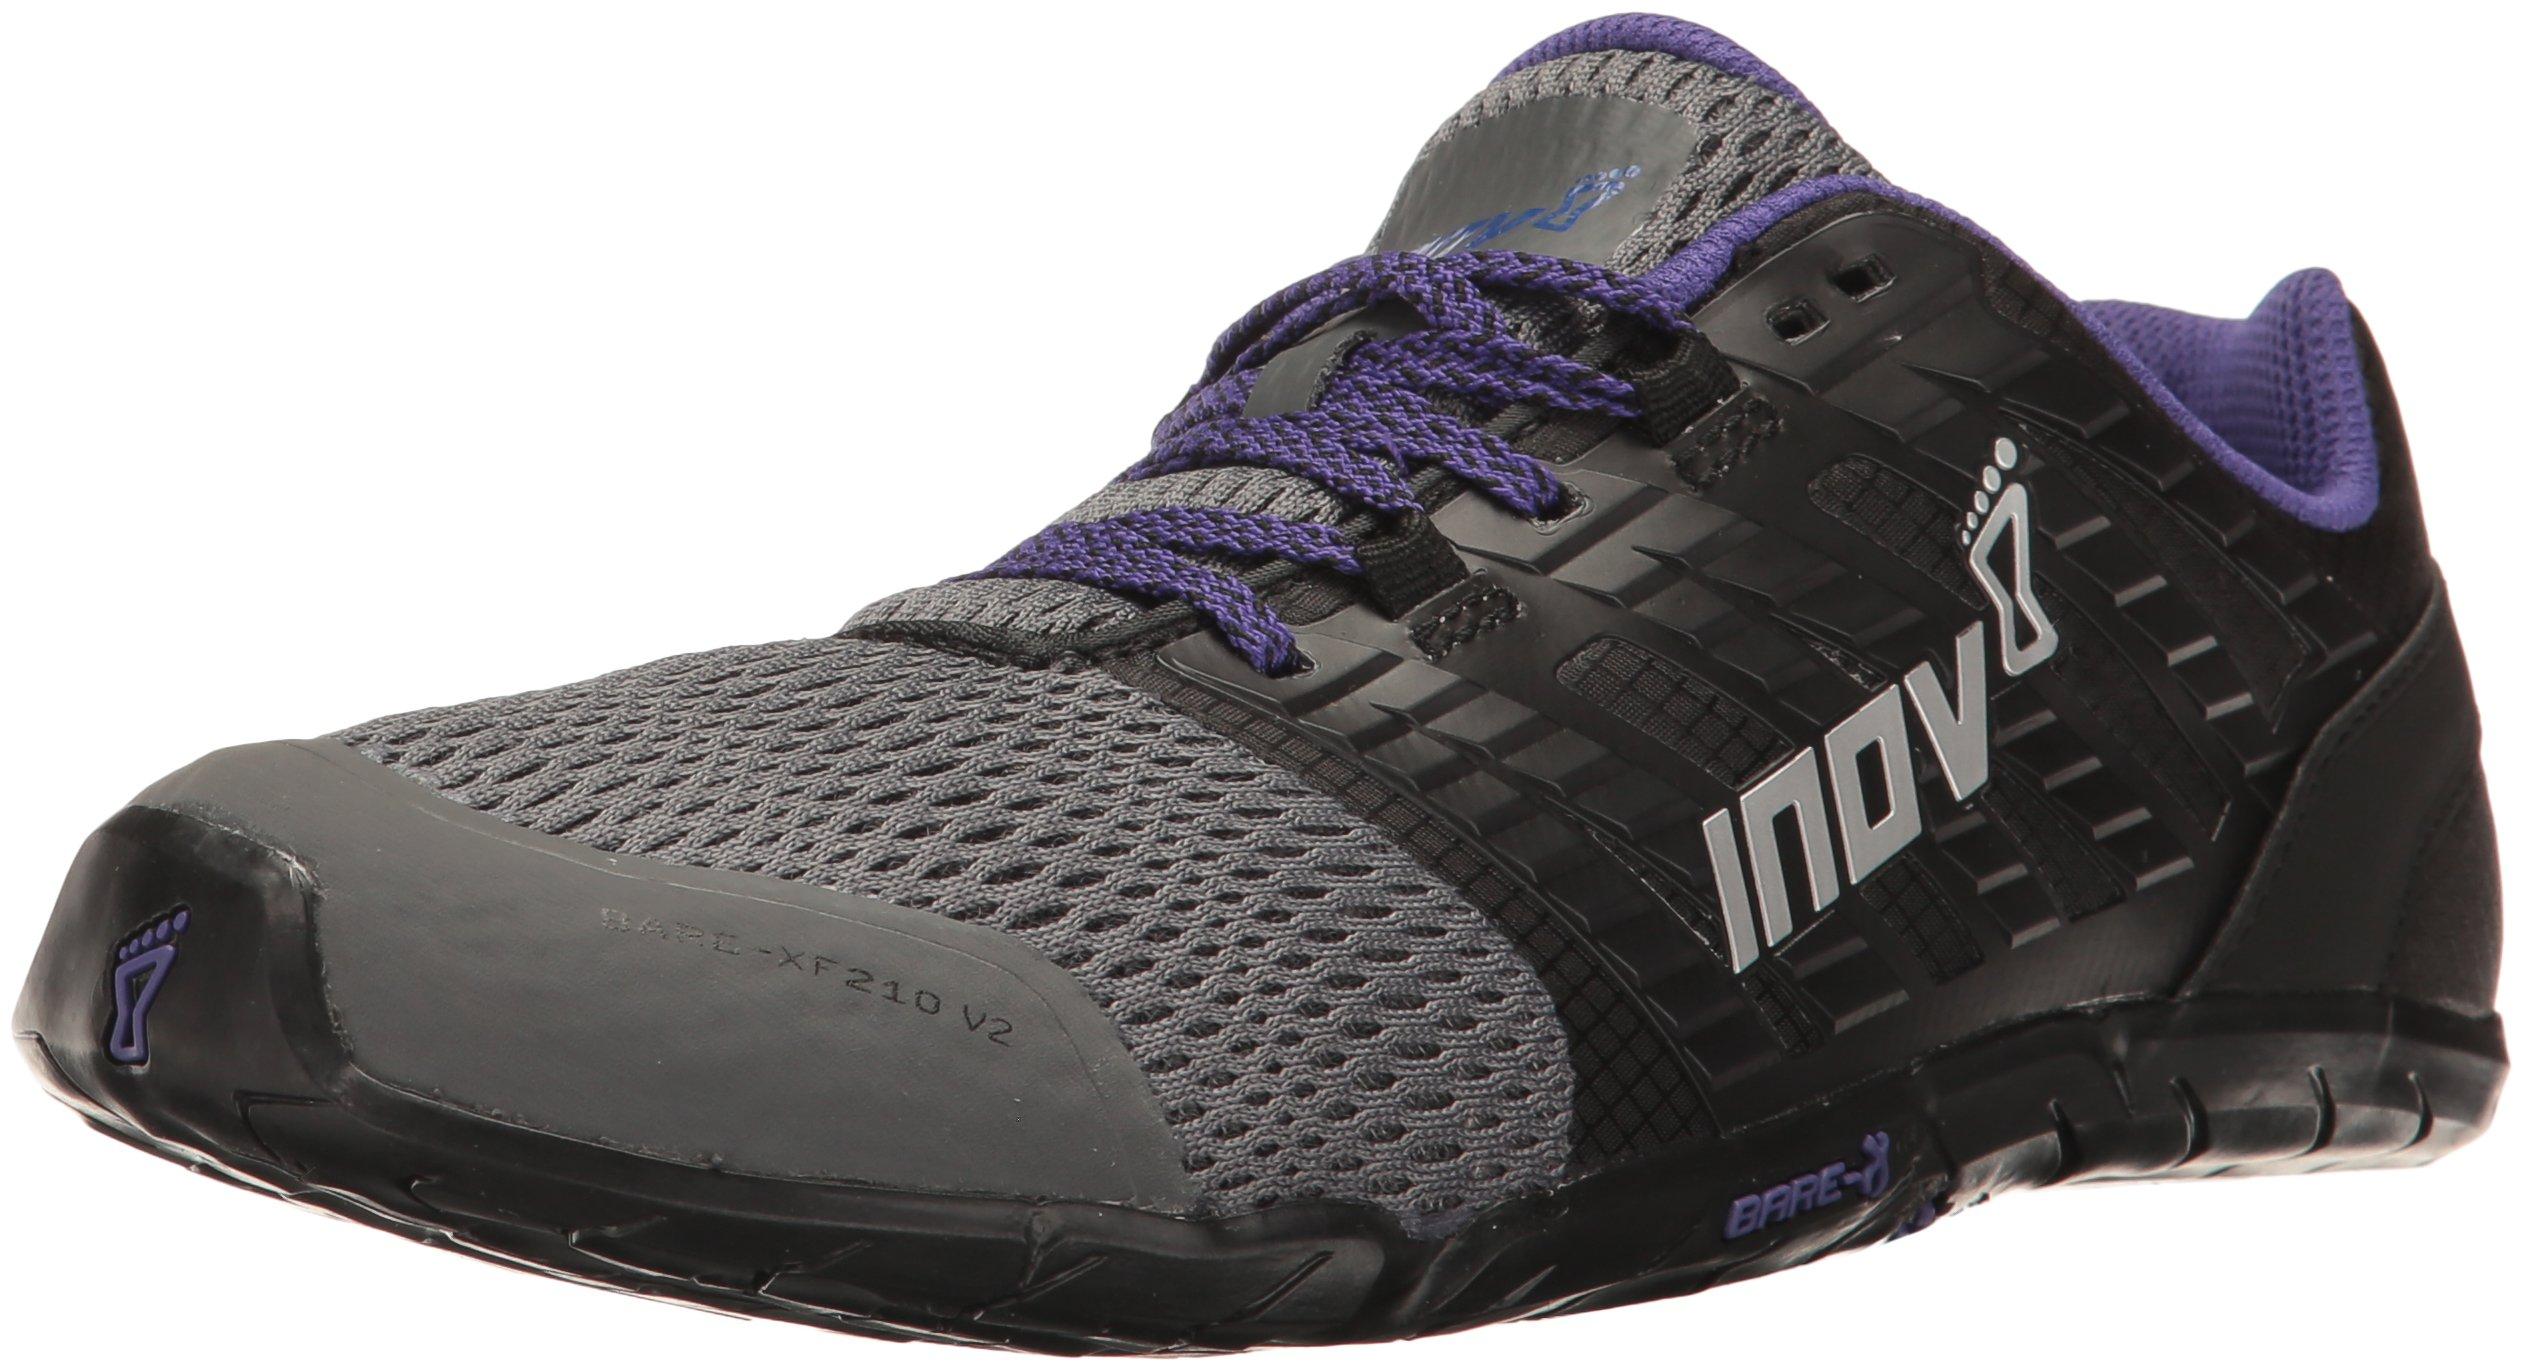 Inov-8 Women's Bare-XF 210 v2 (W) Cross Trainer, Grey/Black/Purple, 6.5 B US by Inov-8